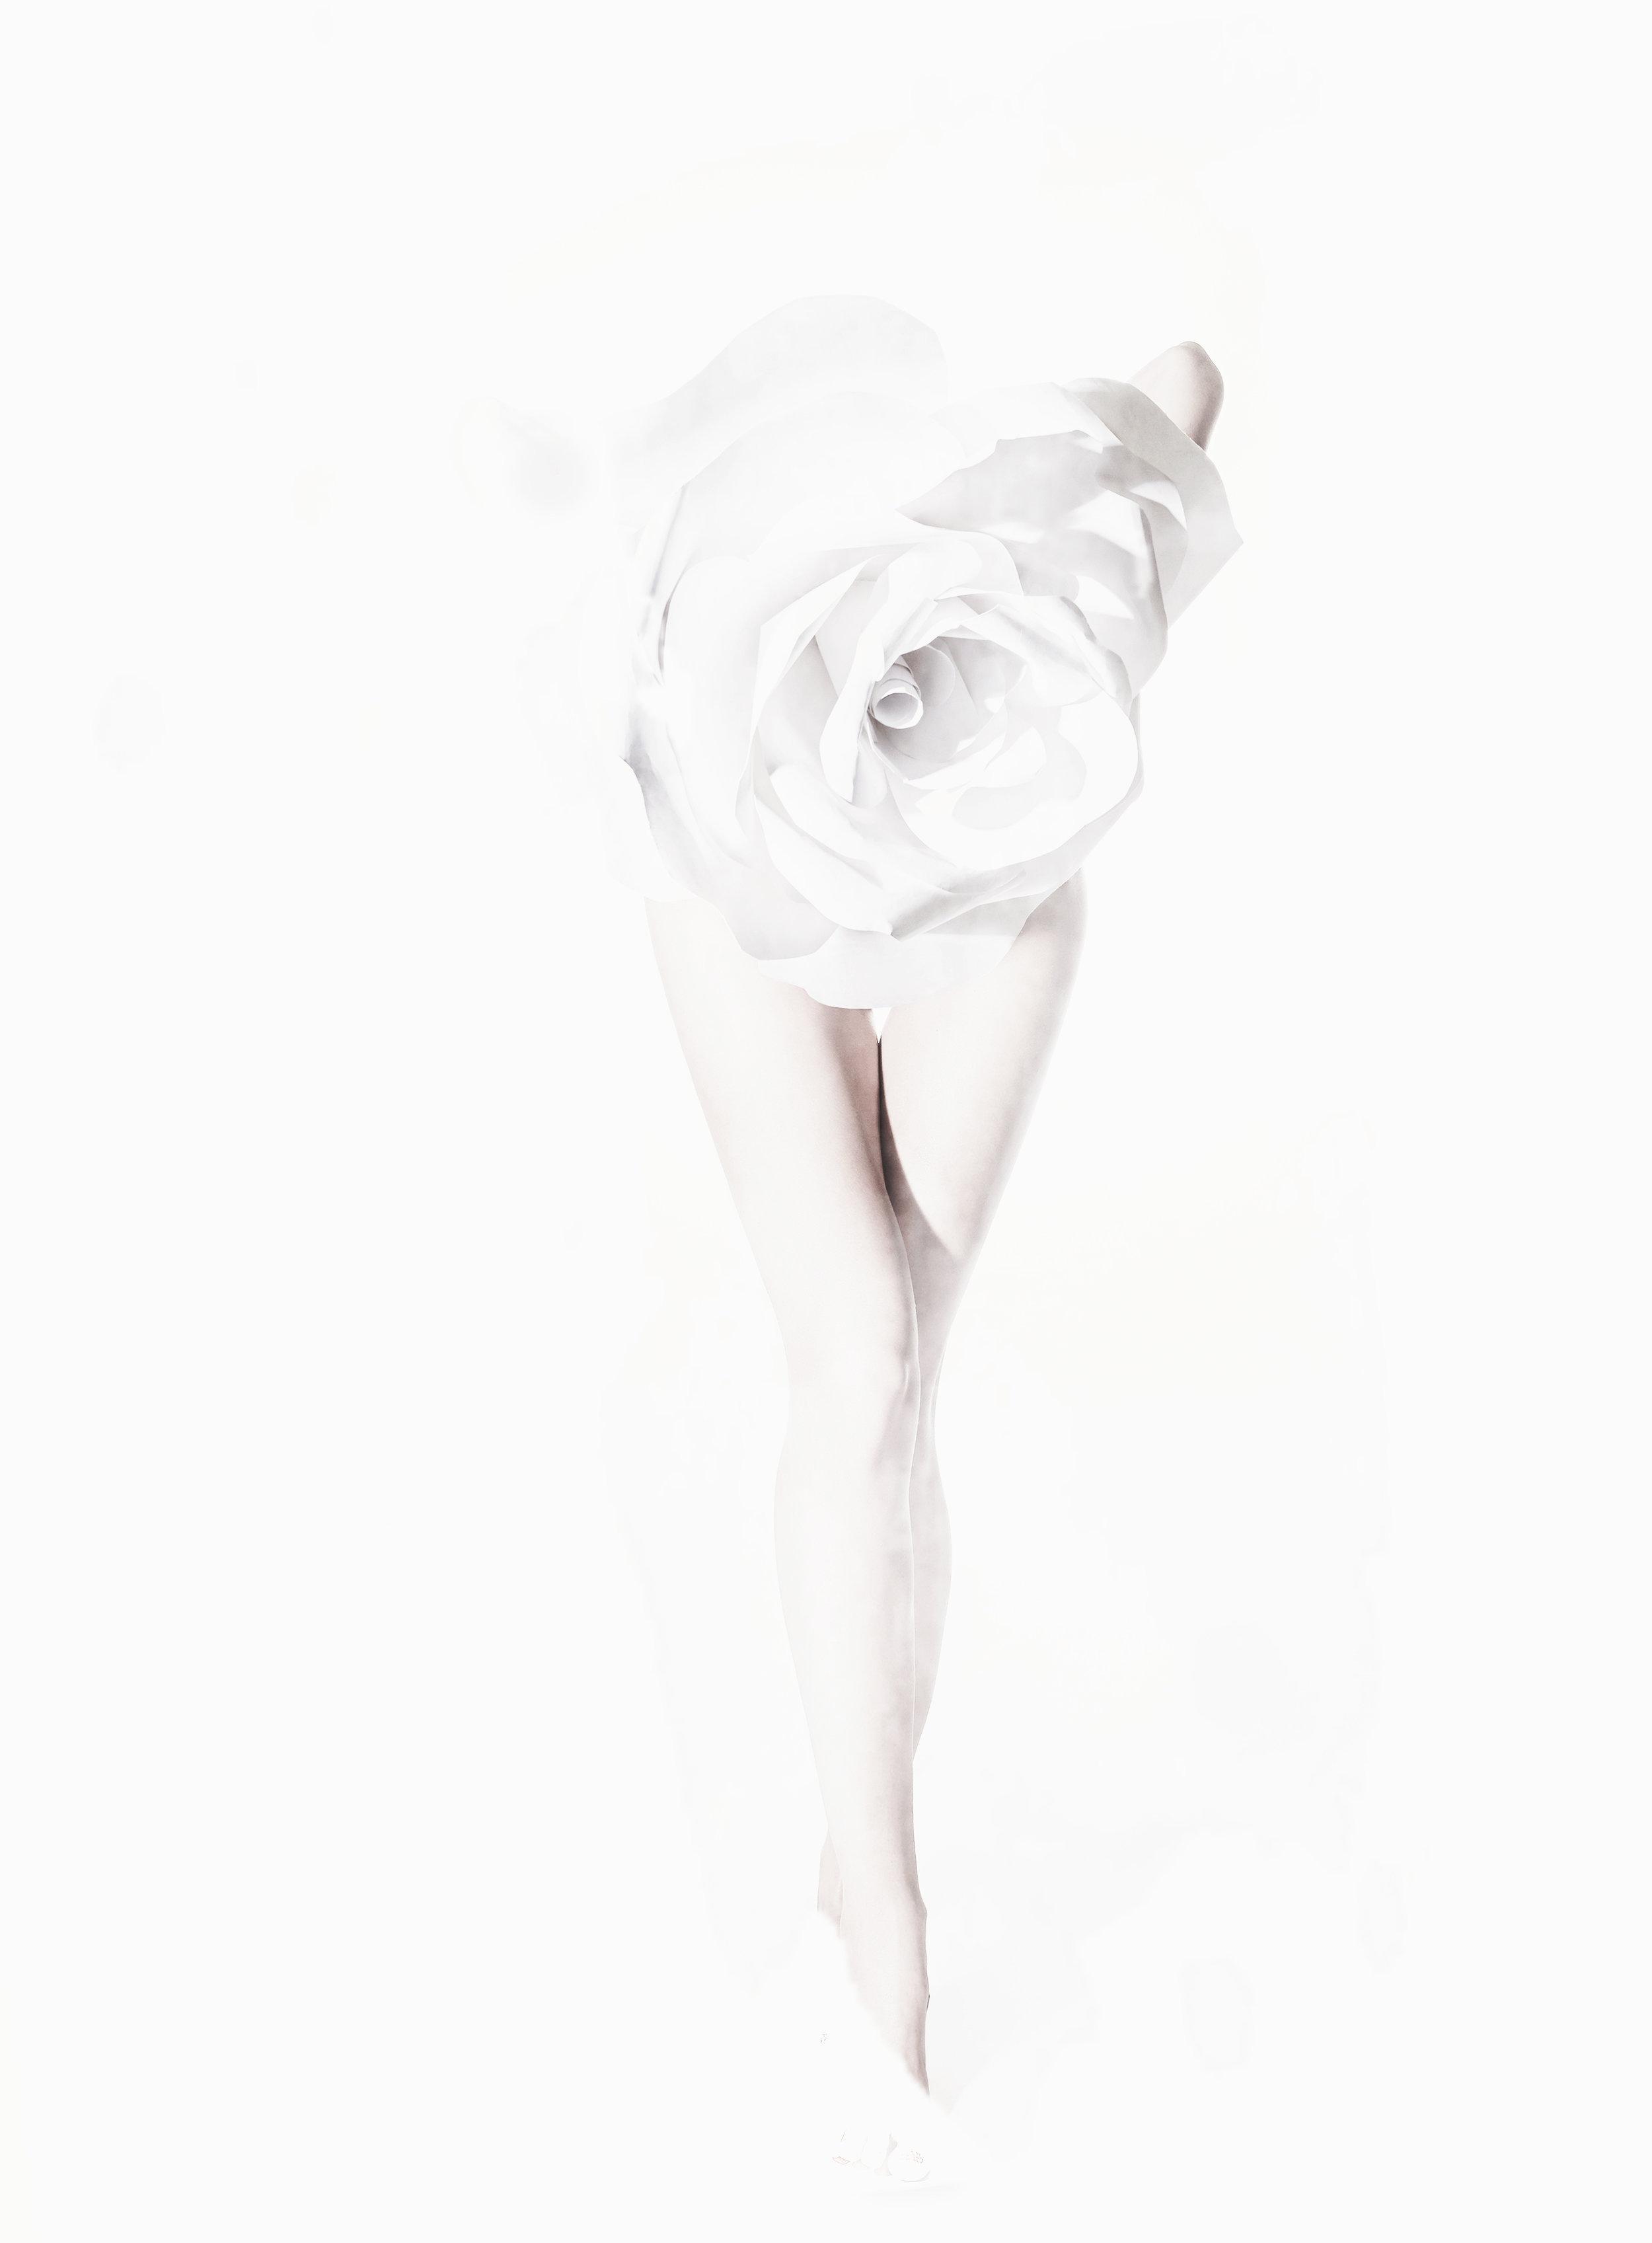 watercolor11_final.jpg